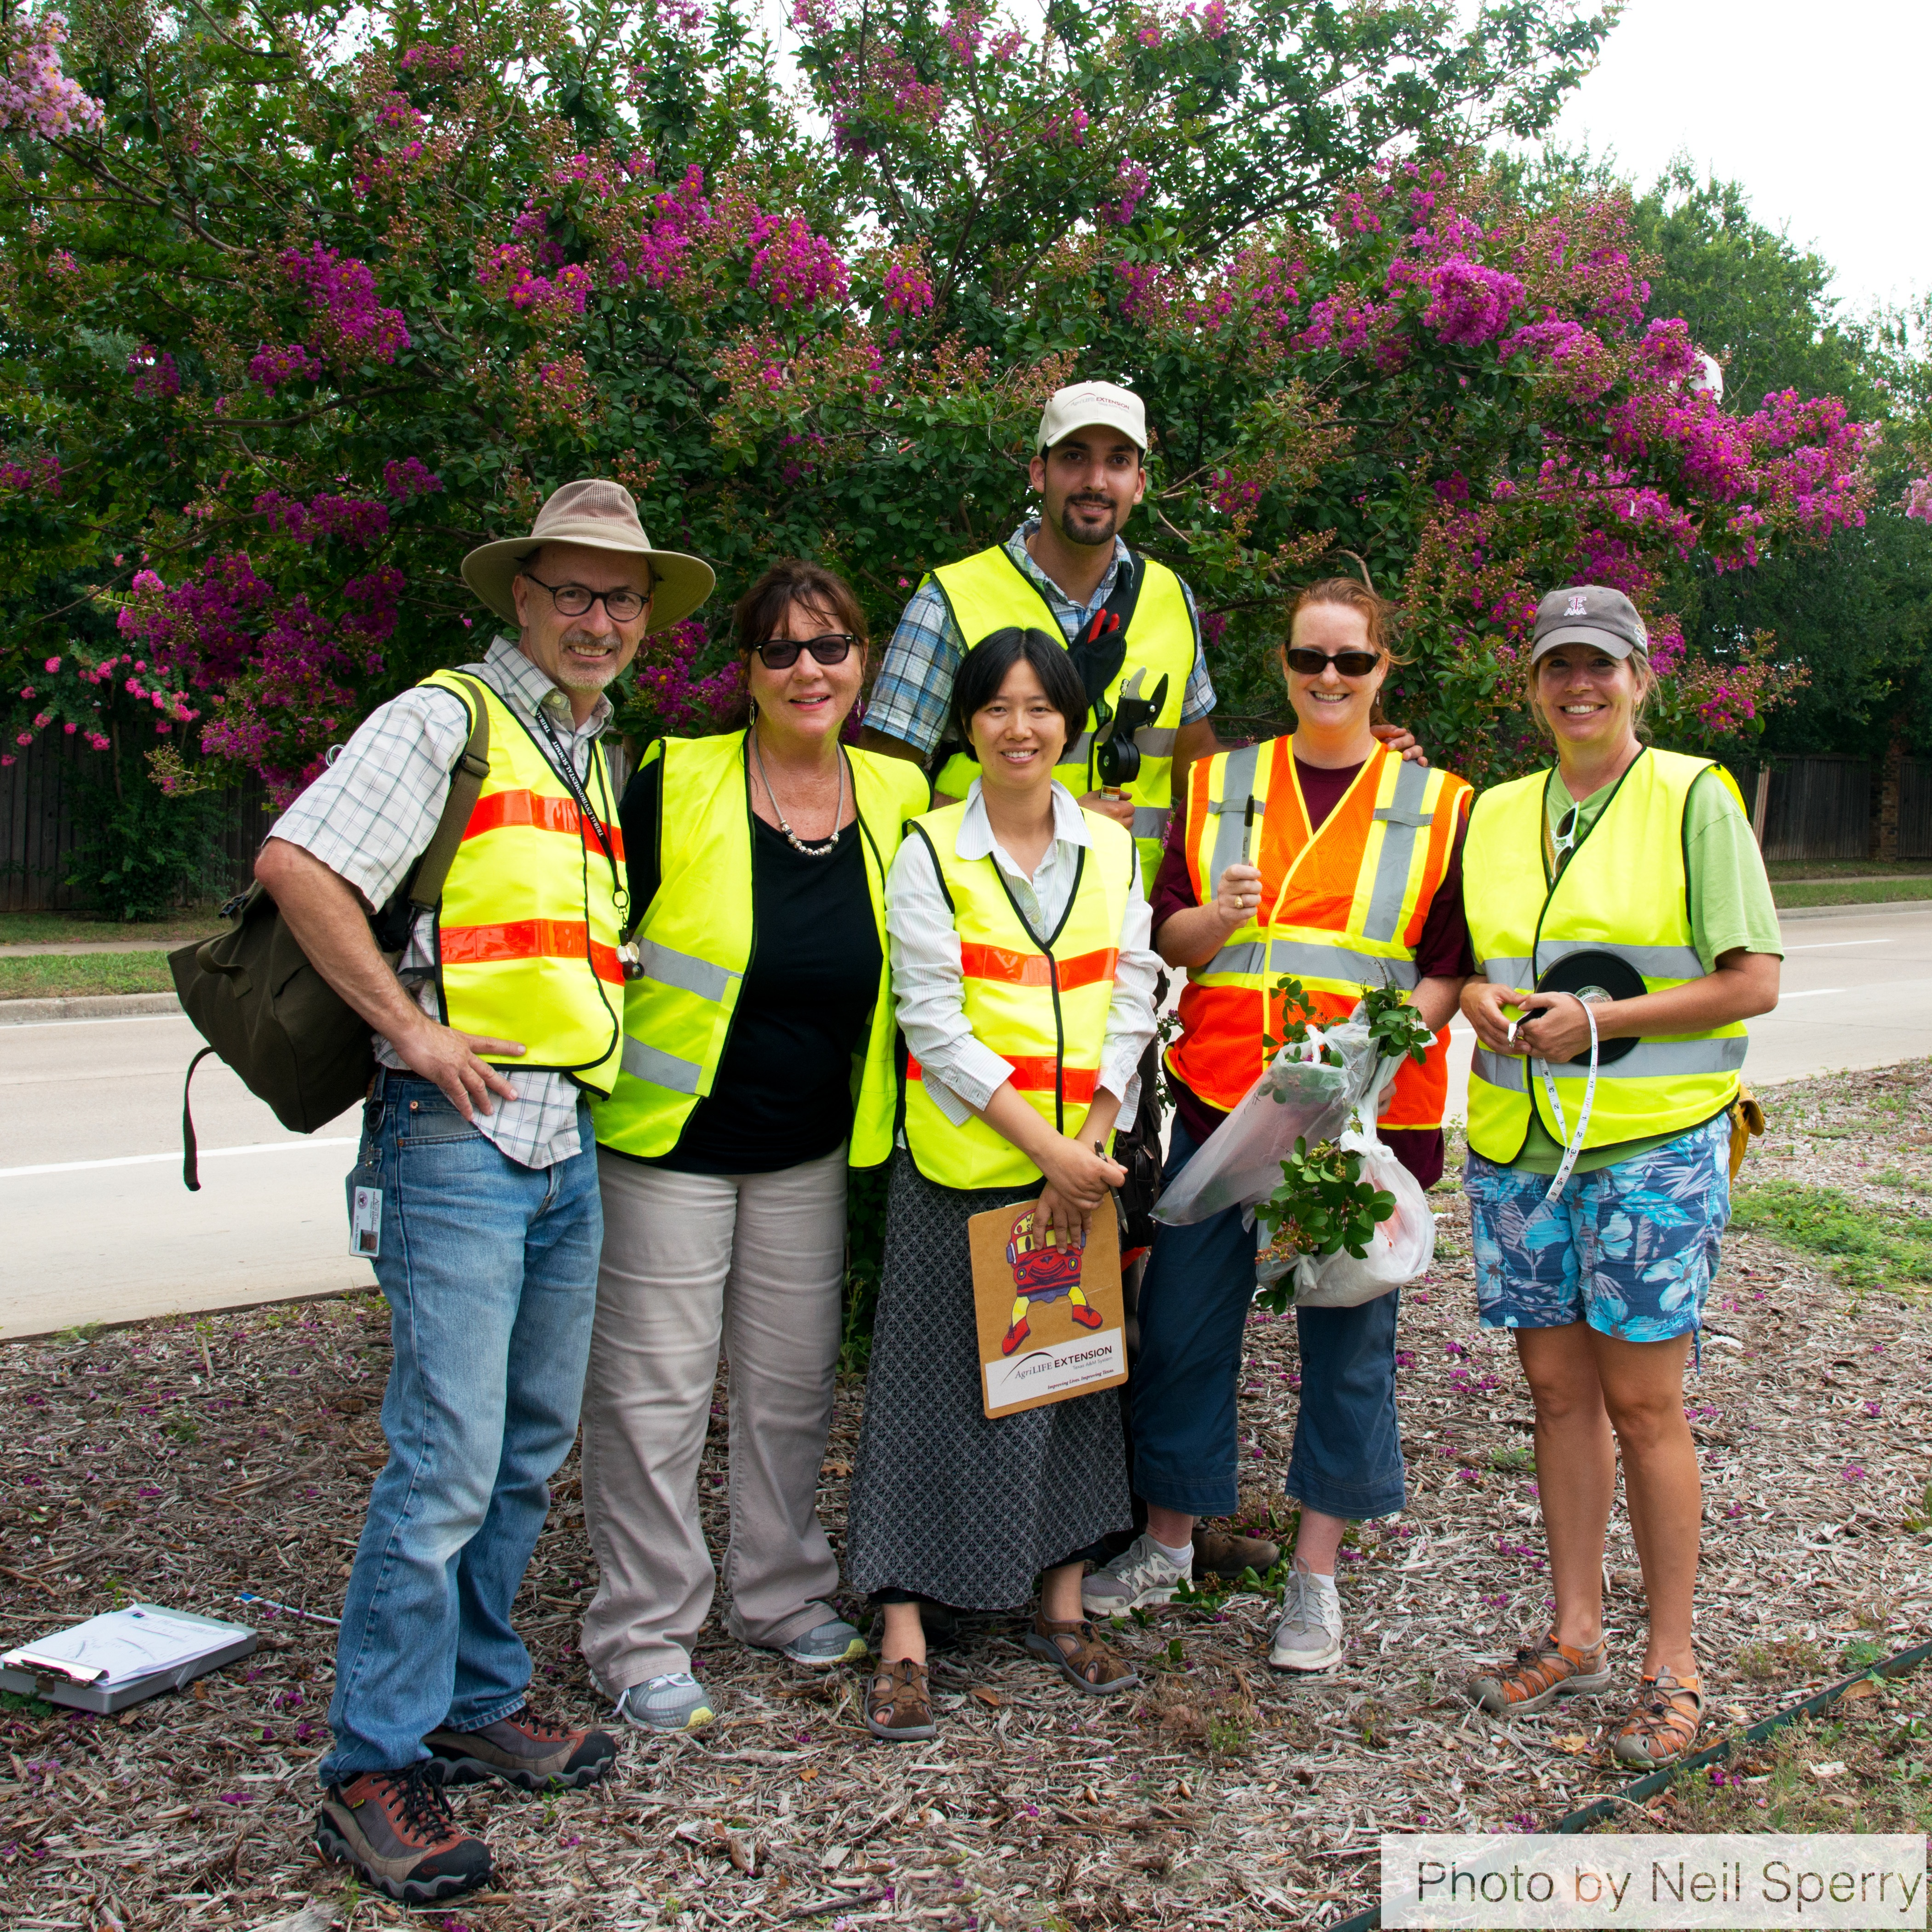 McKinney crape myrtle bark scale infestation assessment team (2014).  From left to right, Dr. Mike Merchant, Susan Owens, (front) Dr. Mengmeng Gu, (back) Erfan Vafaie, Laura Miller, Janet Laminack.